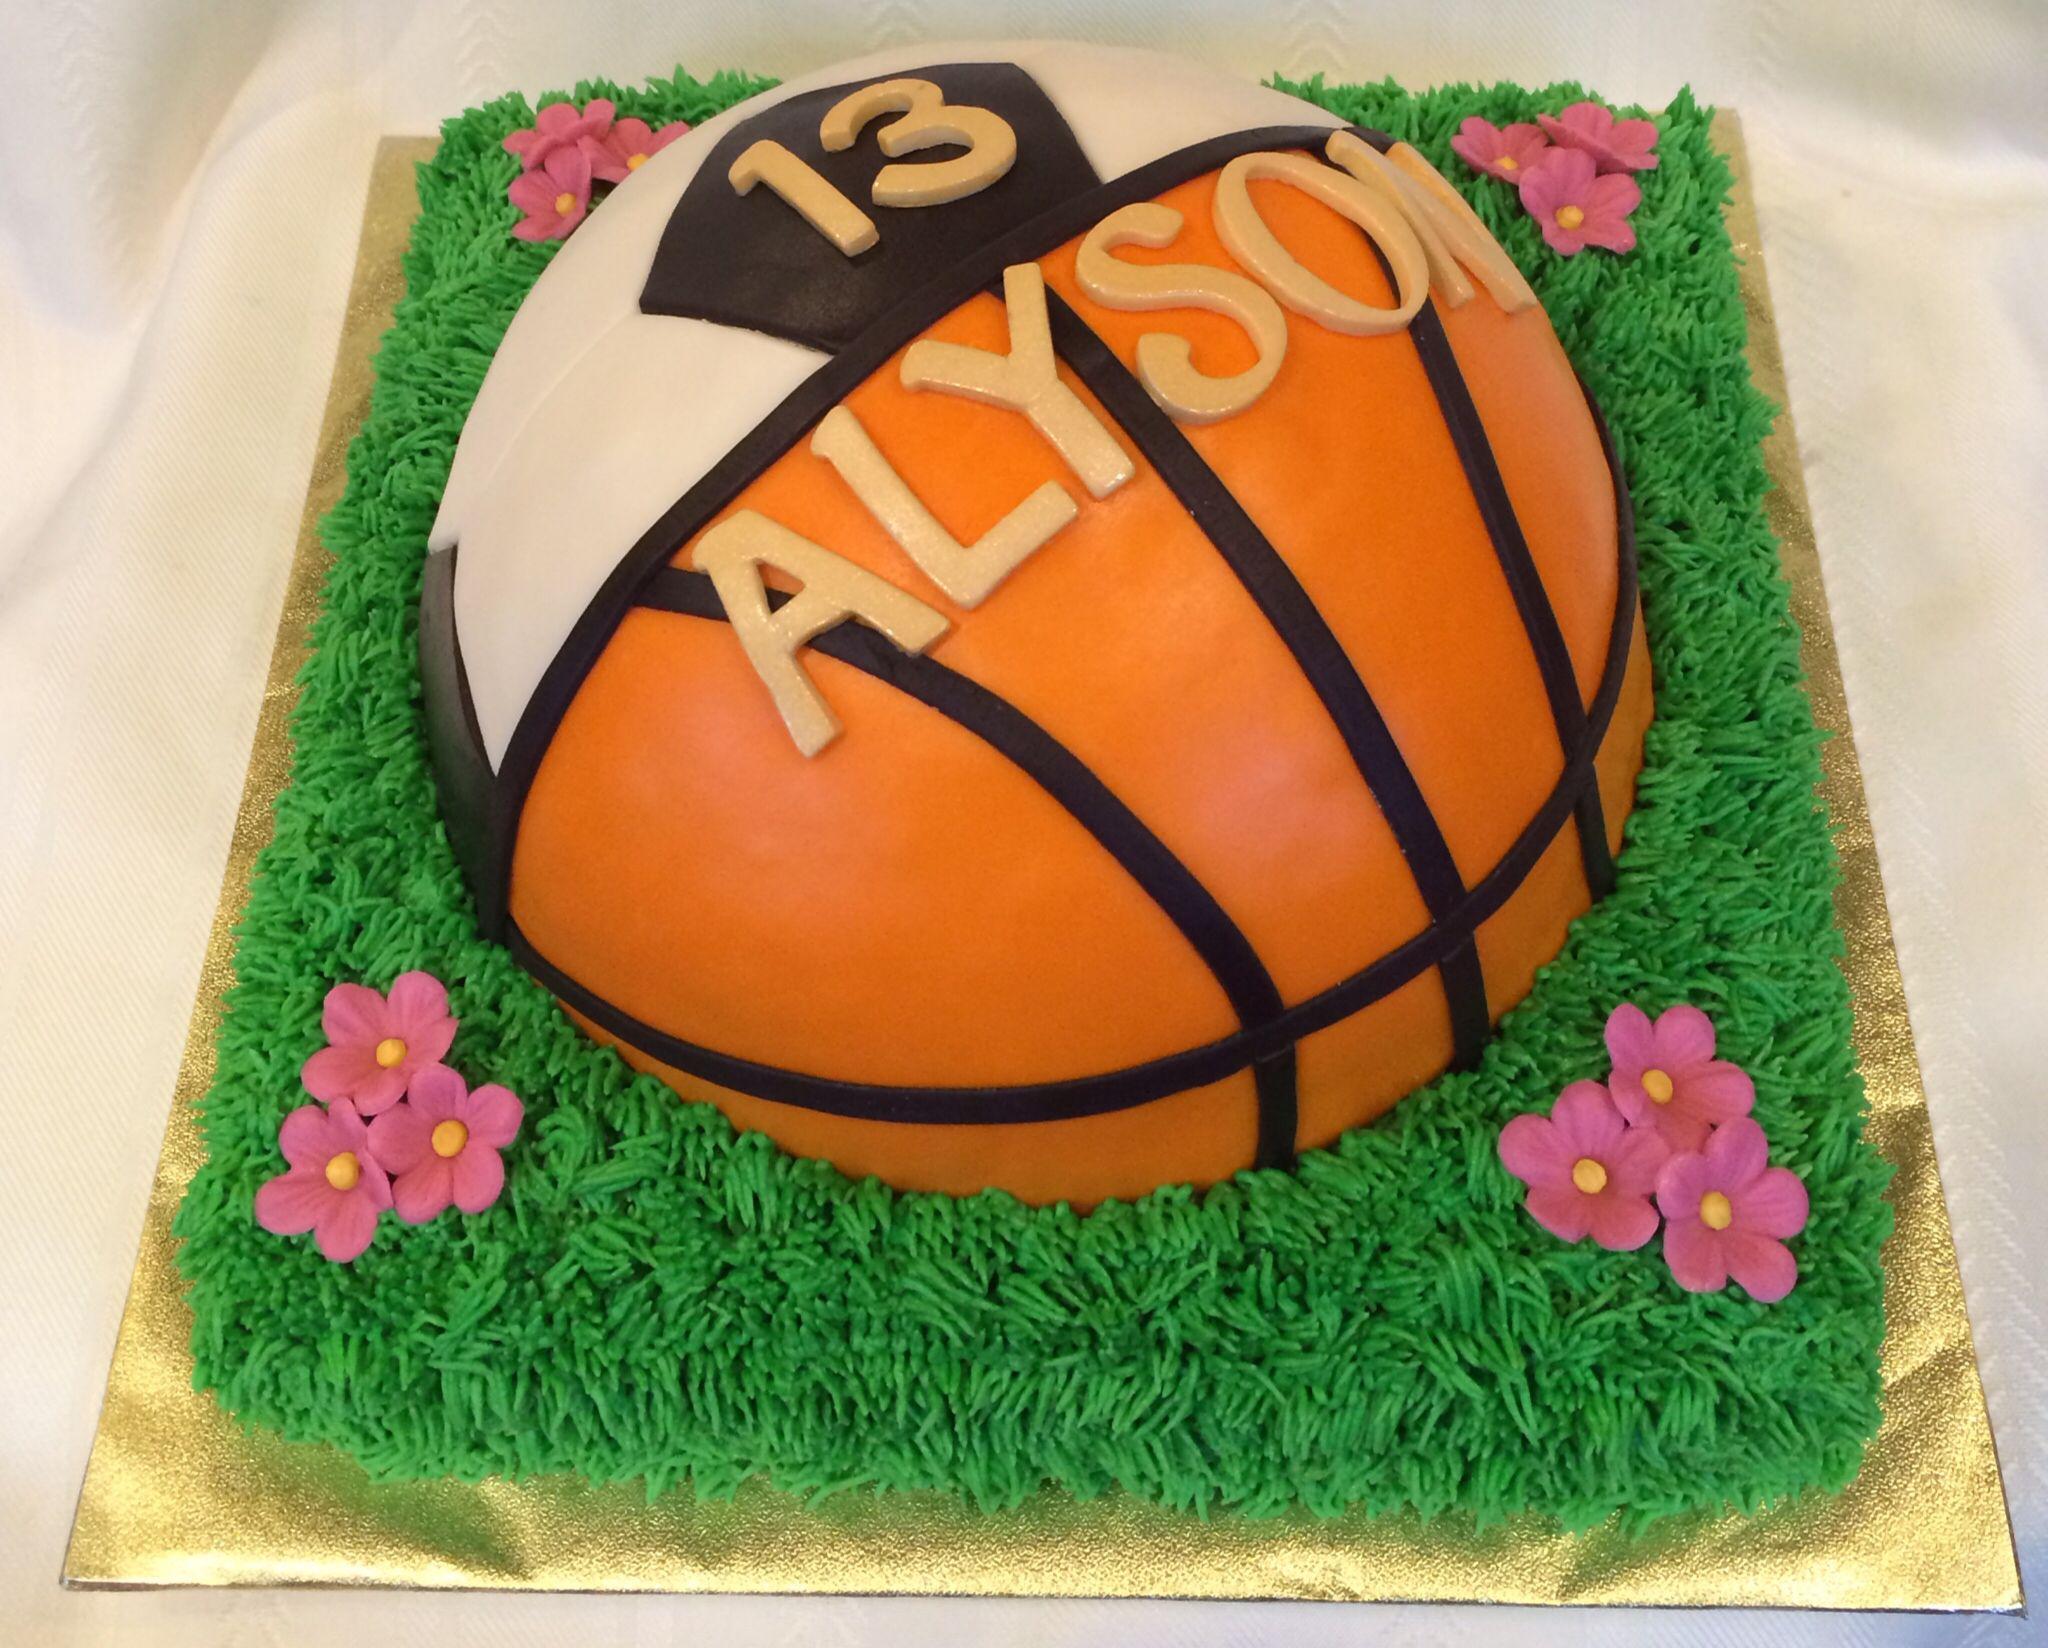 Basketball Soccer Cake Birthday Cake Girls Girl Cupcakes Sports Themed Cakes